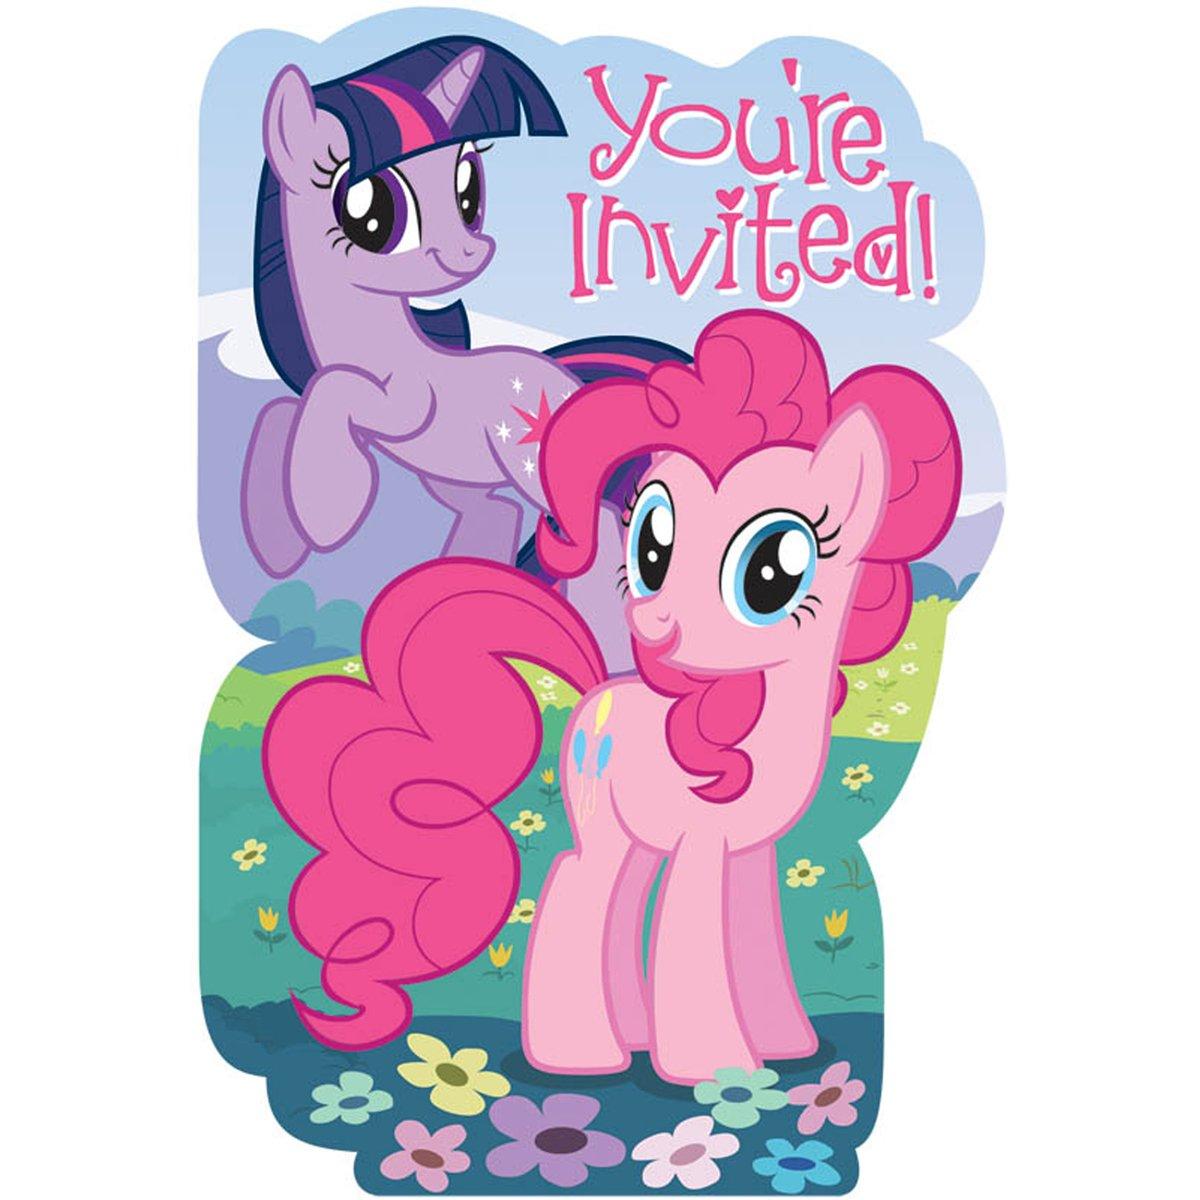 My Little Pony Birthday Cards and Invitations | Birthday Girls Wikii